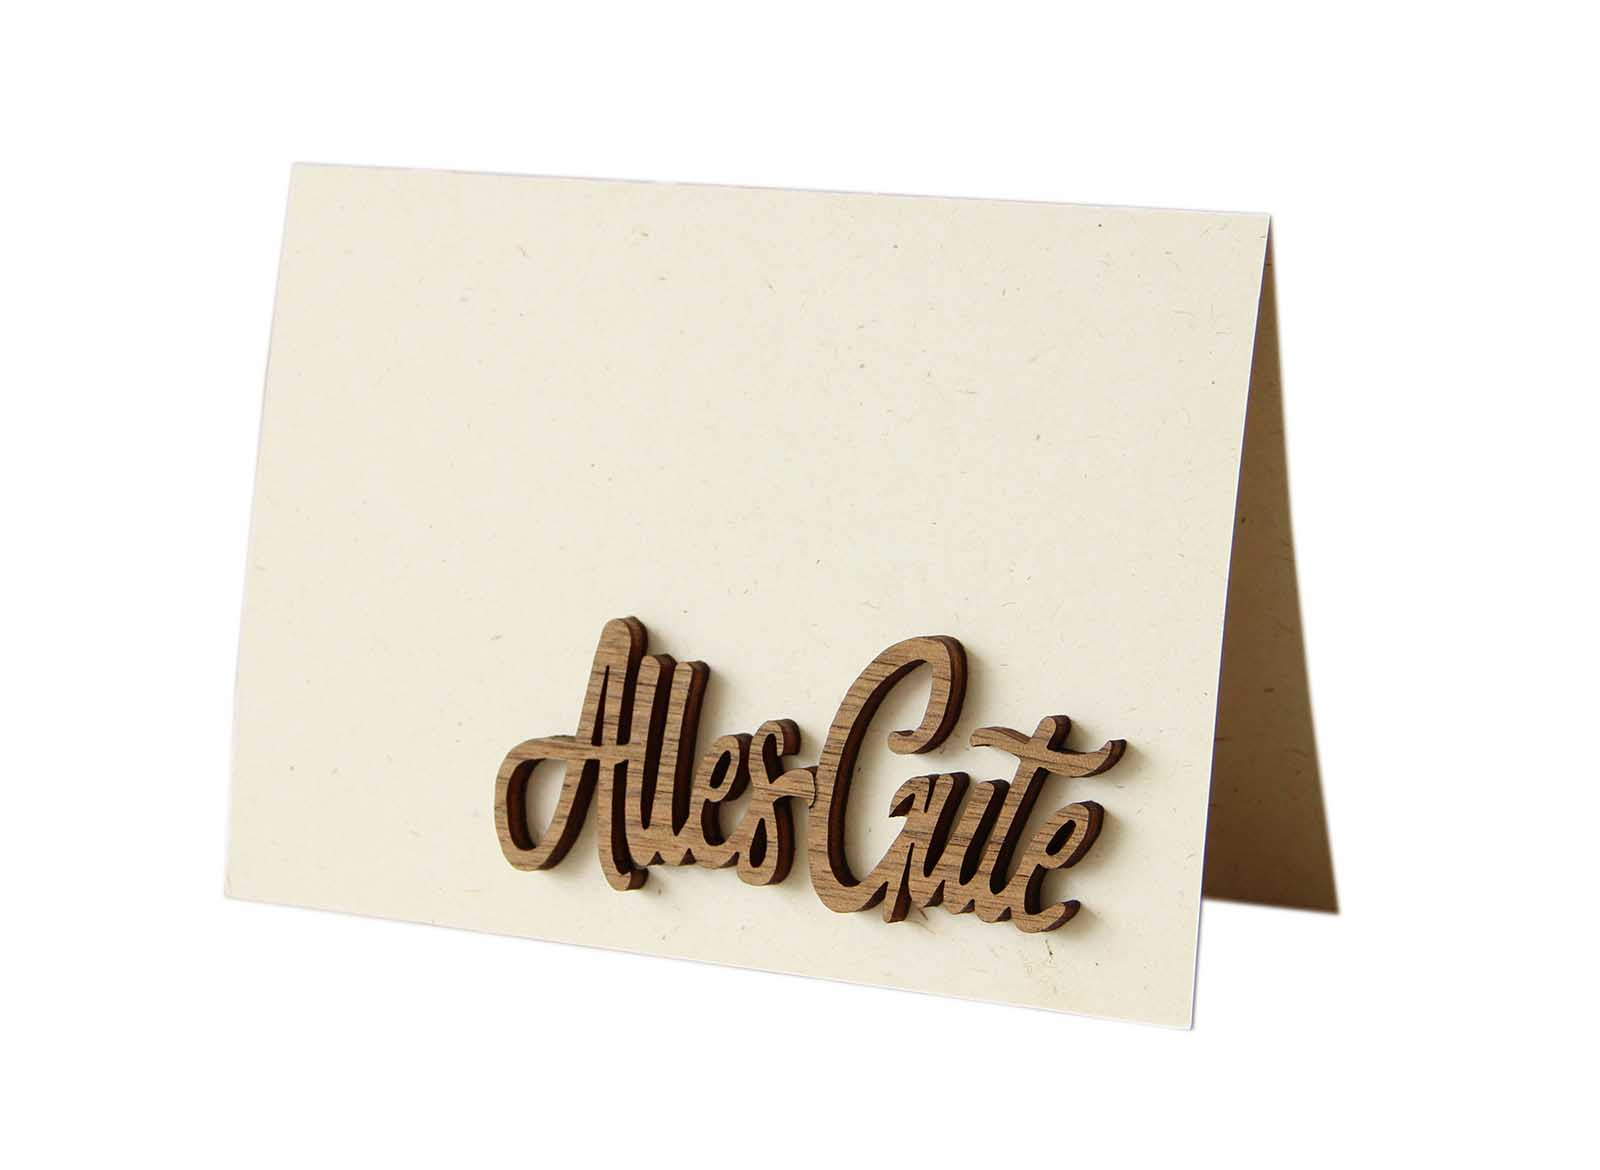 "Original Holzgrußkarte - Papierkarte mit Schriftzug aus Echtholz in Nuss ""Alles Gute"", Postkarte, Geschenkkarte, Klappkarte, Karte, Geburtstagskarte"